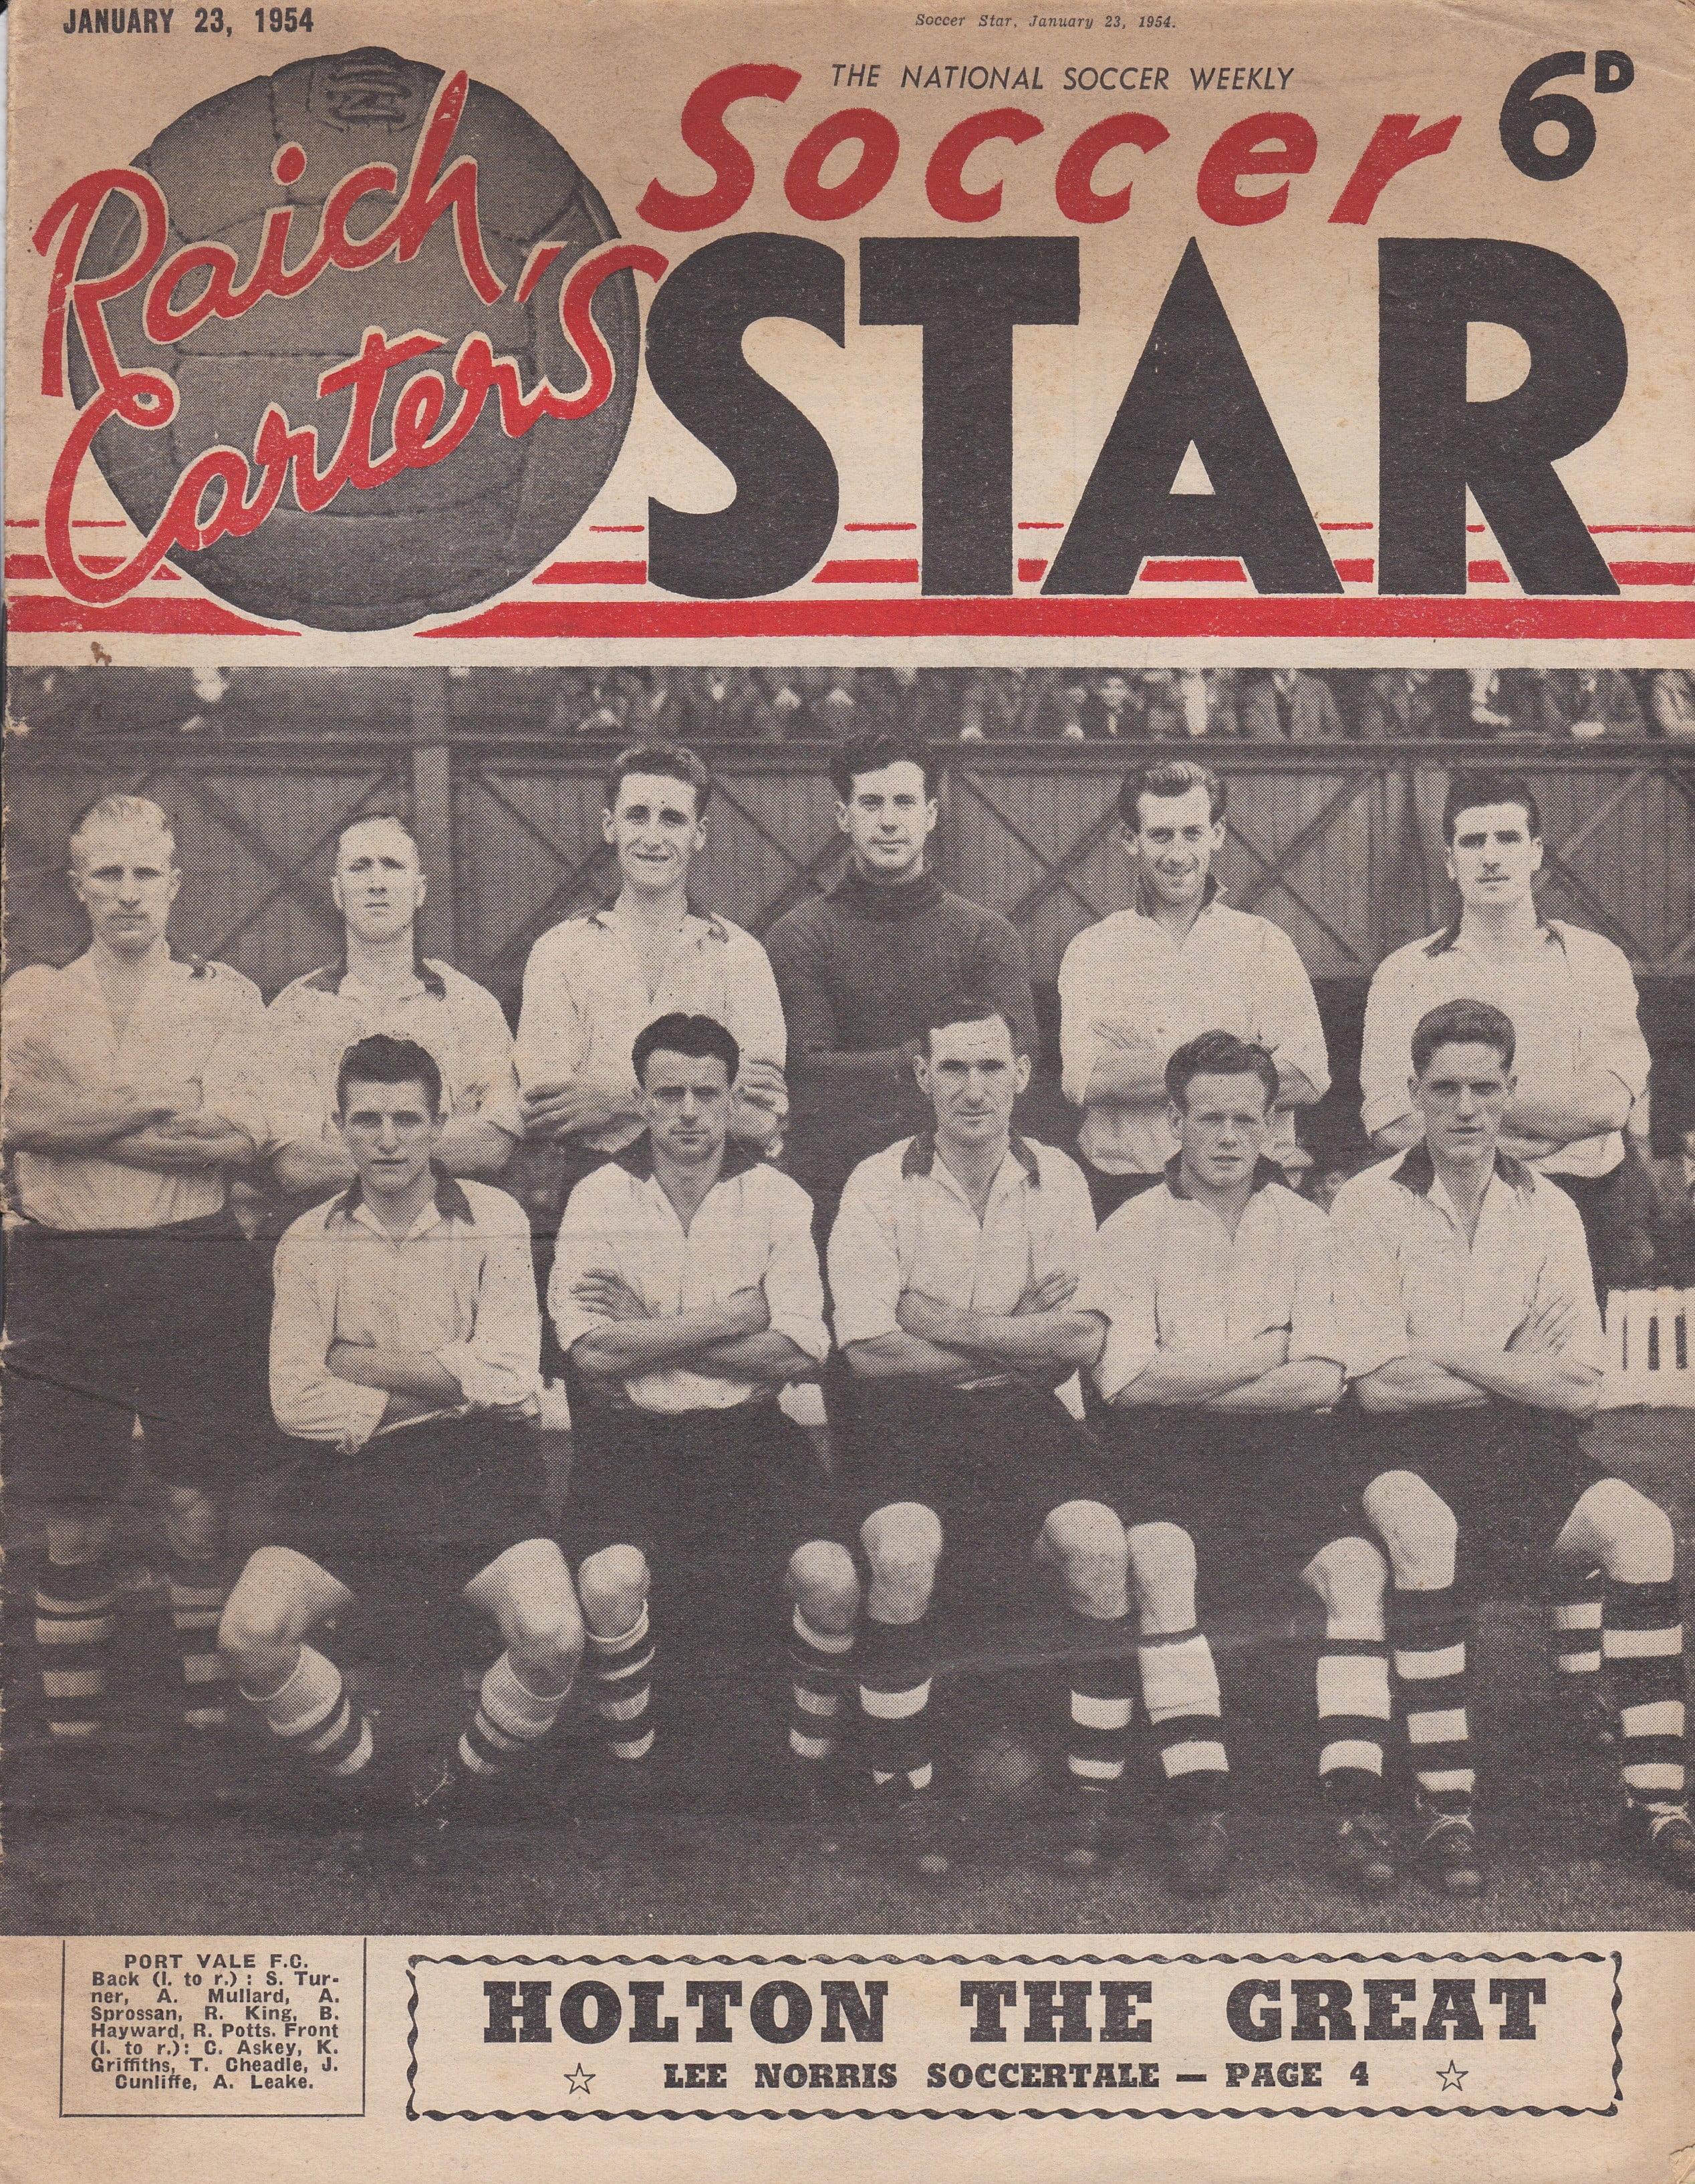 Port Vale 1954 team